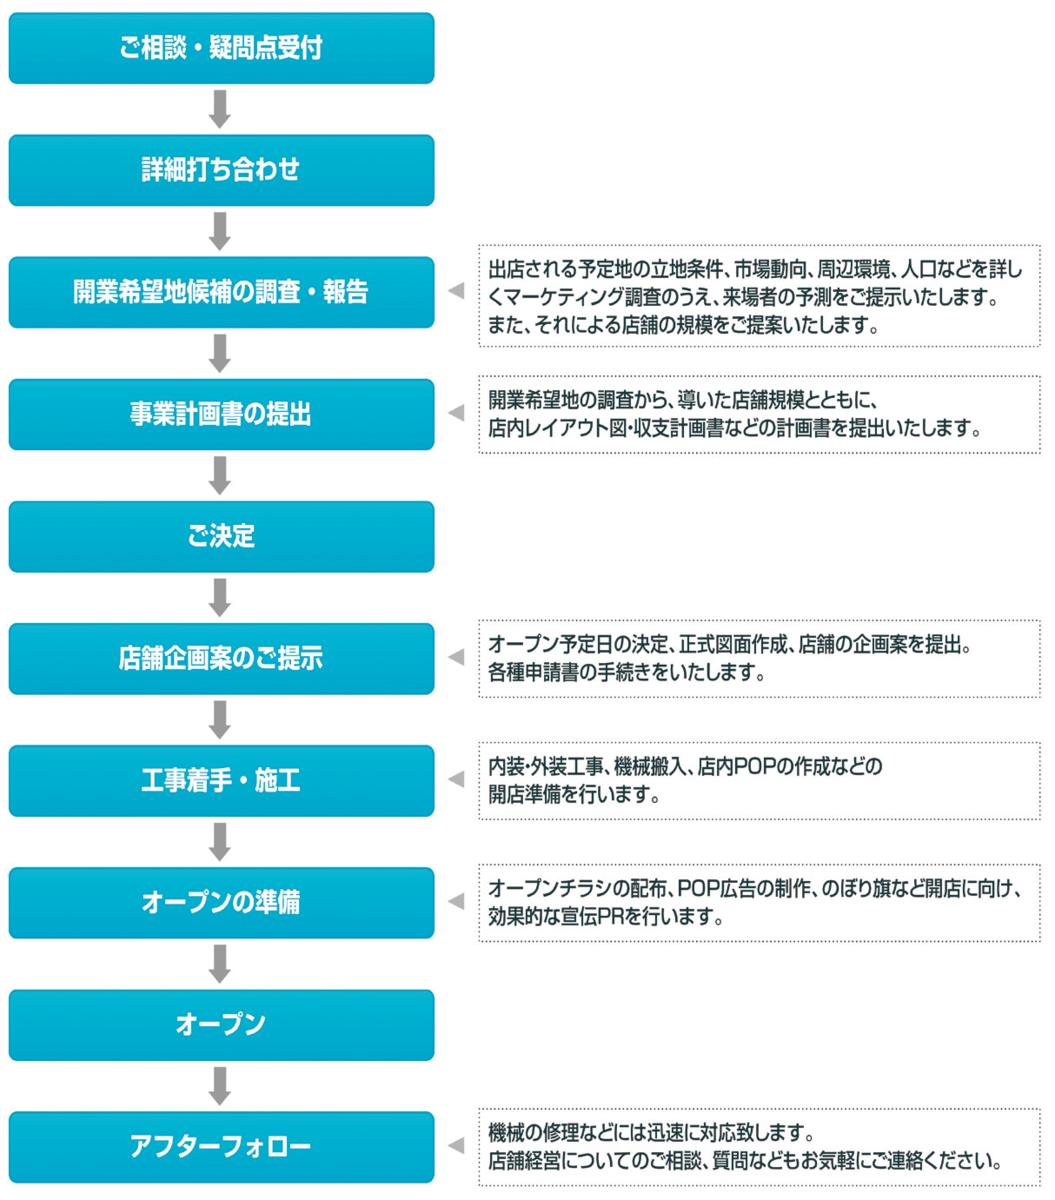 f:id:murakamihjm:20200906041230p:plain